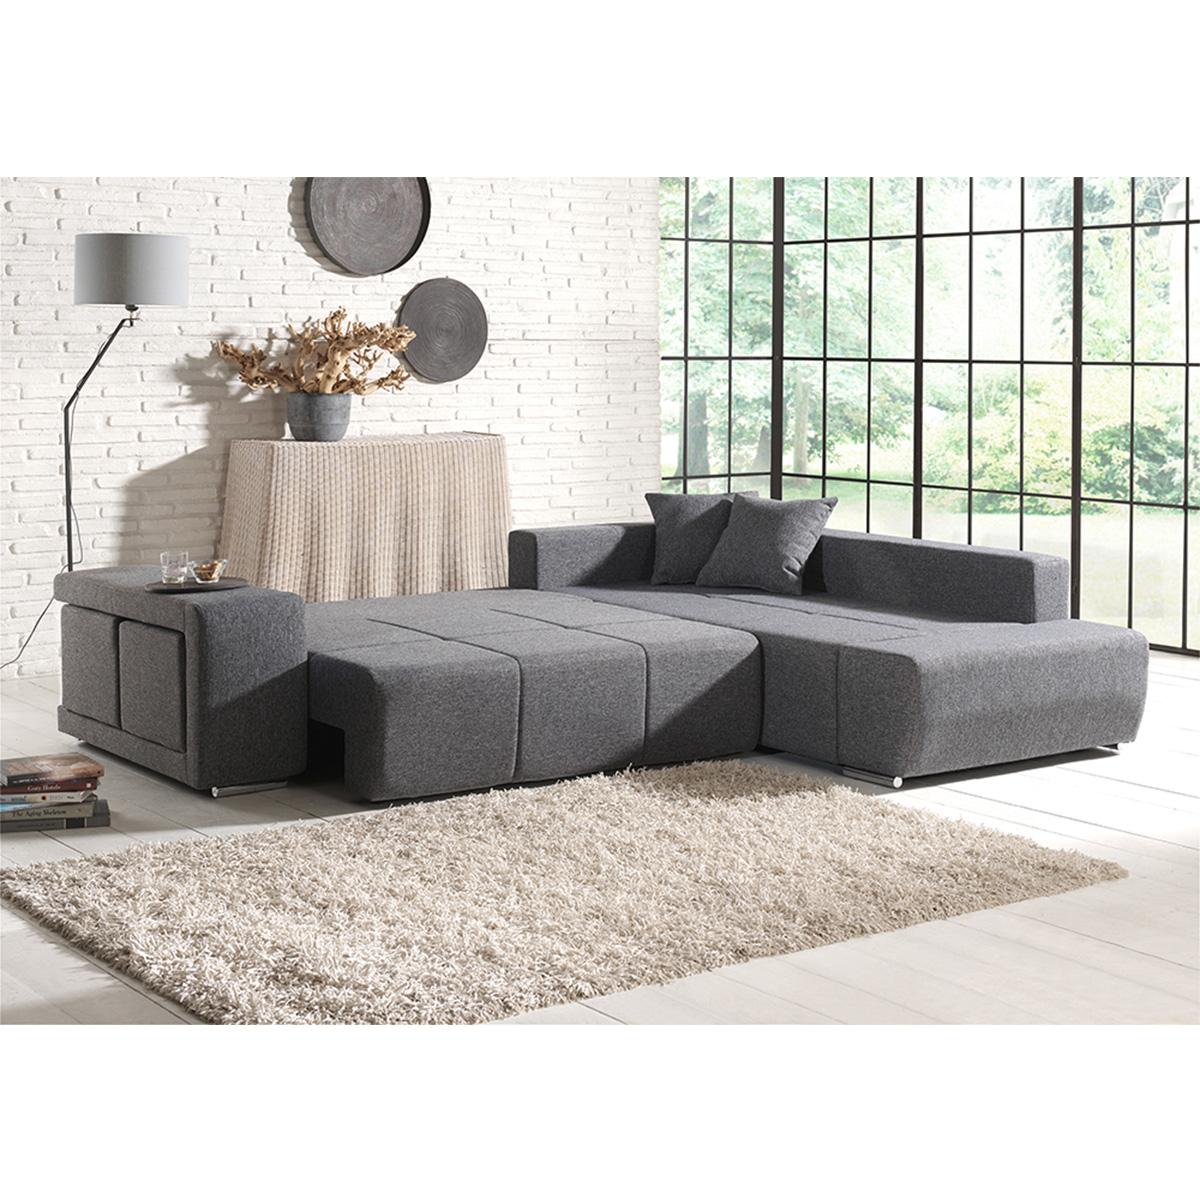 wohnlandschaft antibes mit schlaffunktion moebel trend 24. Black Bedroom Furniture Sets. Home Design Ideas